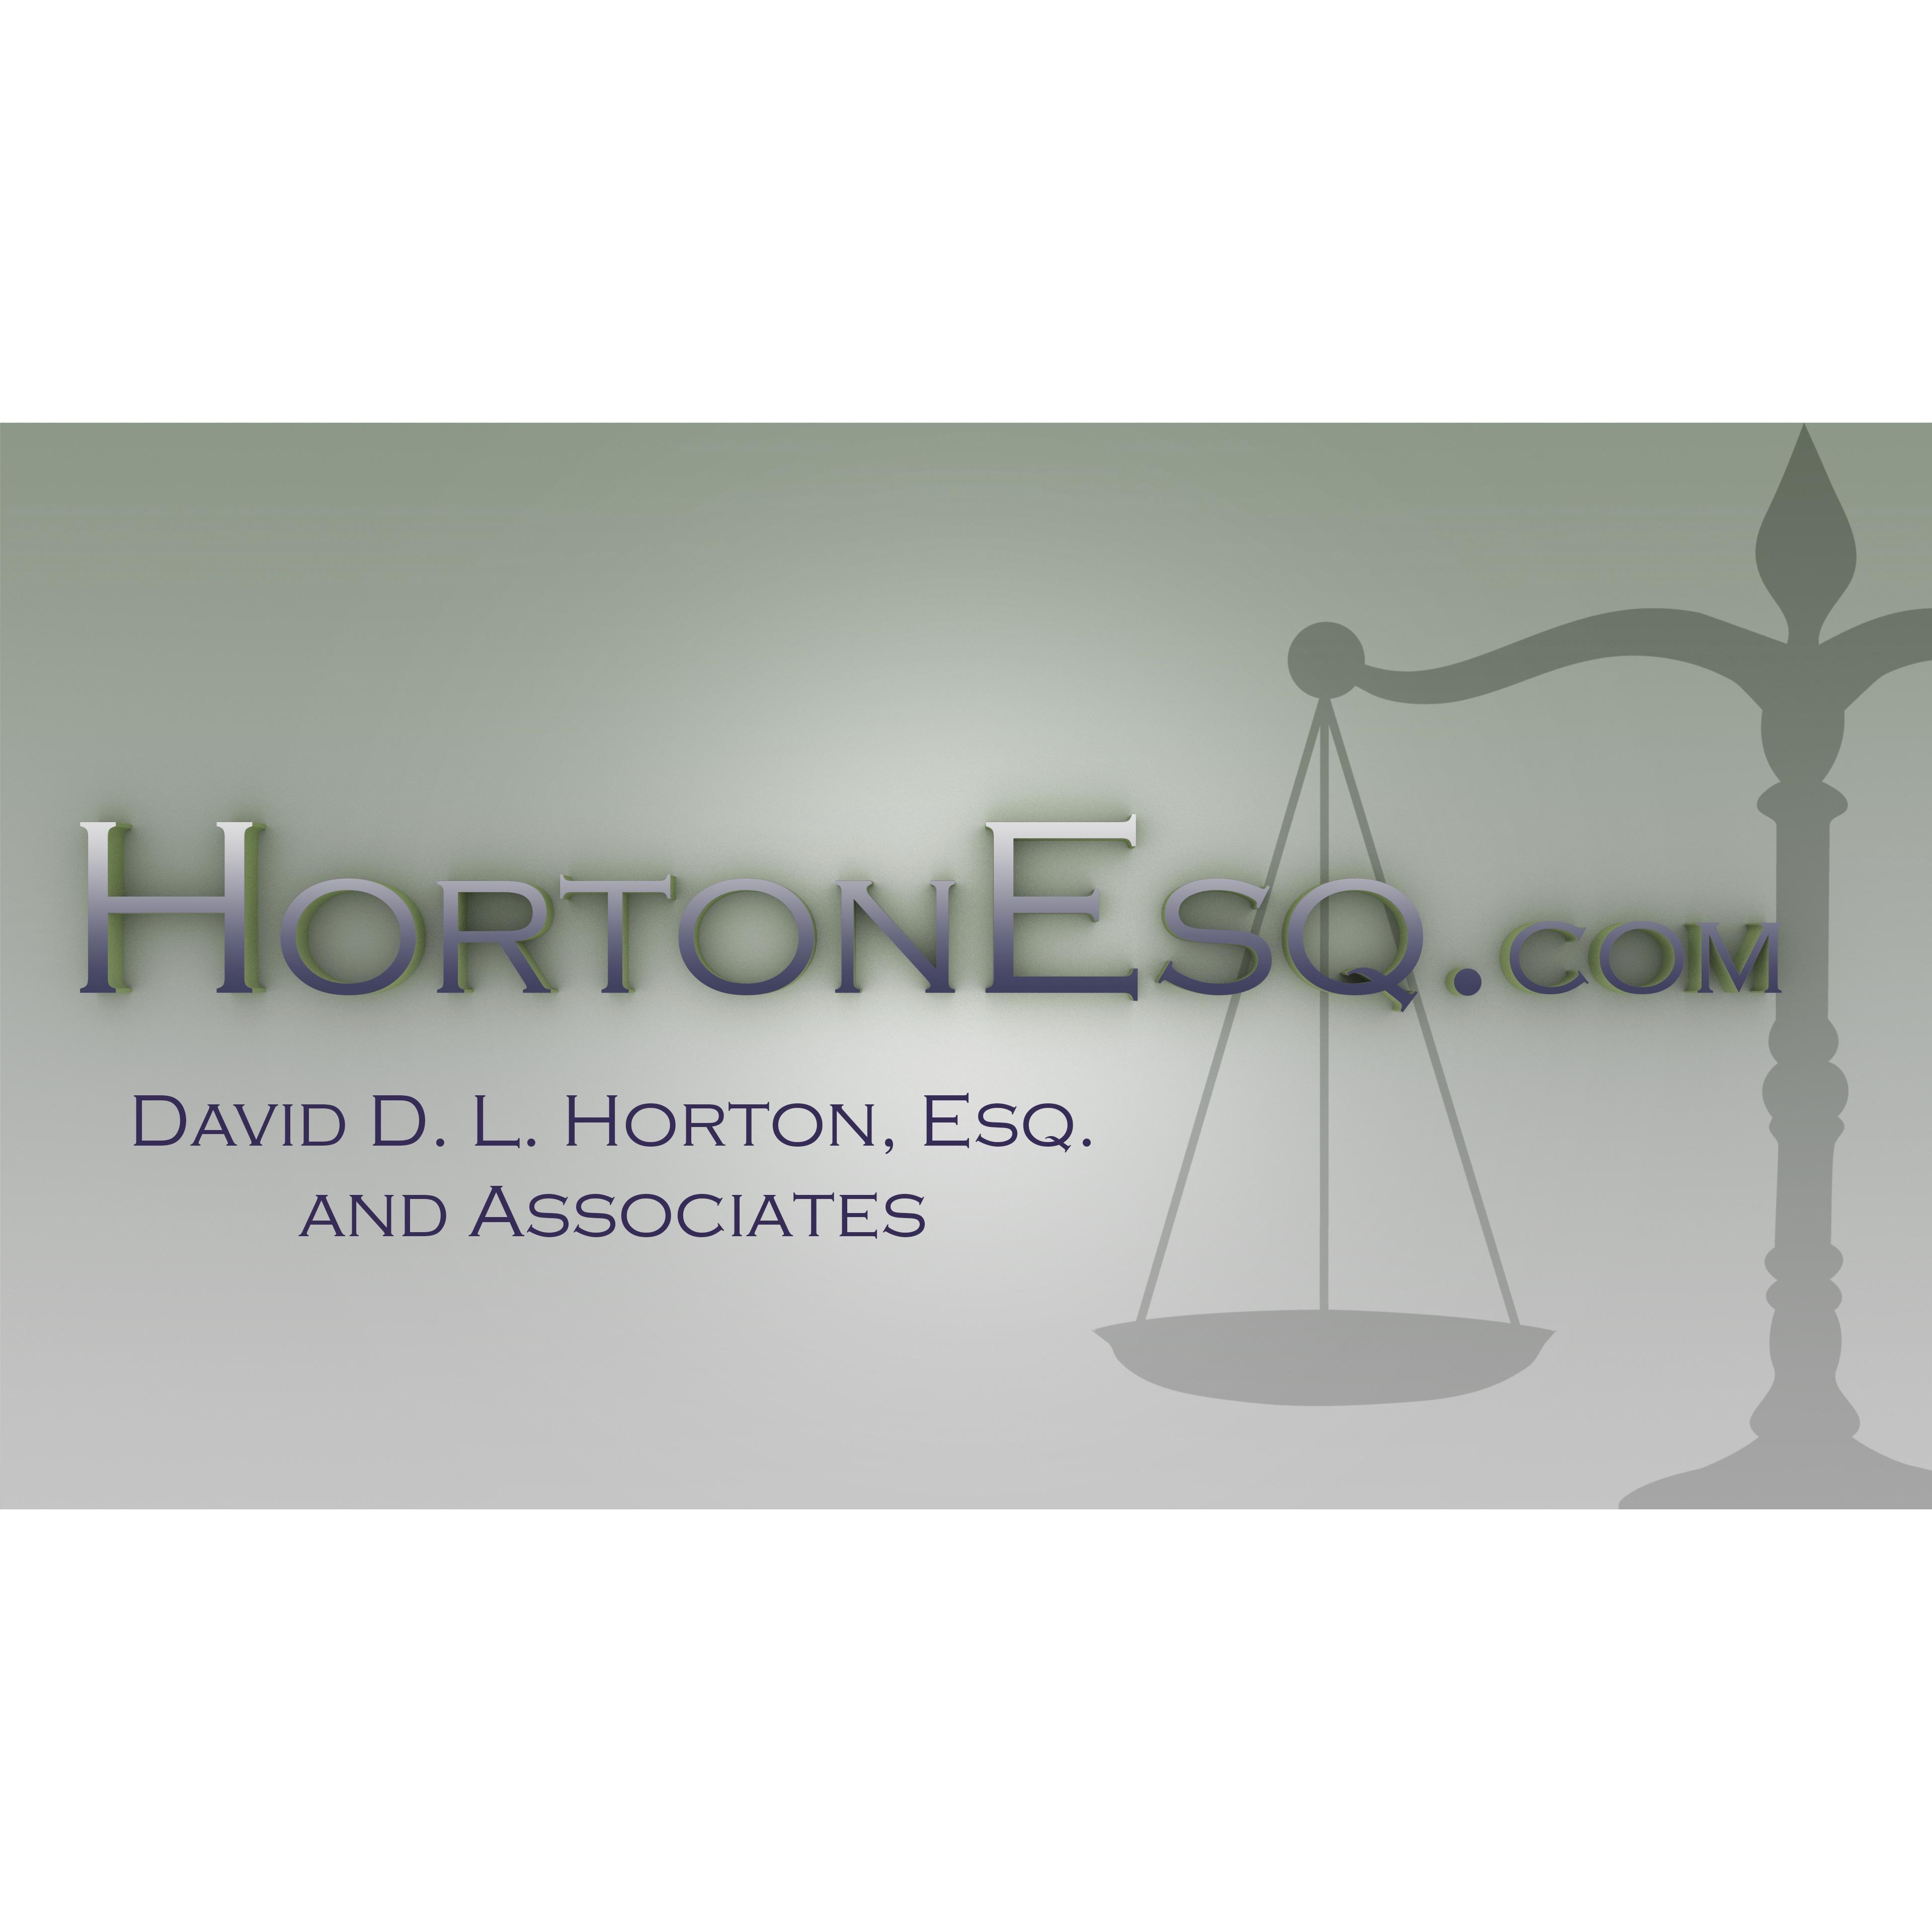 Attorney Riverside CA   David DL Horton Esq & Assoc